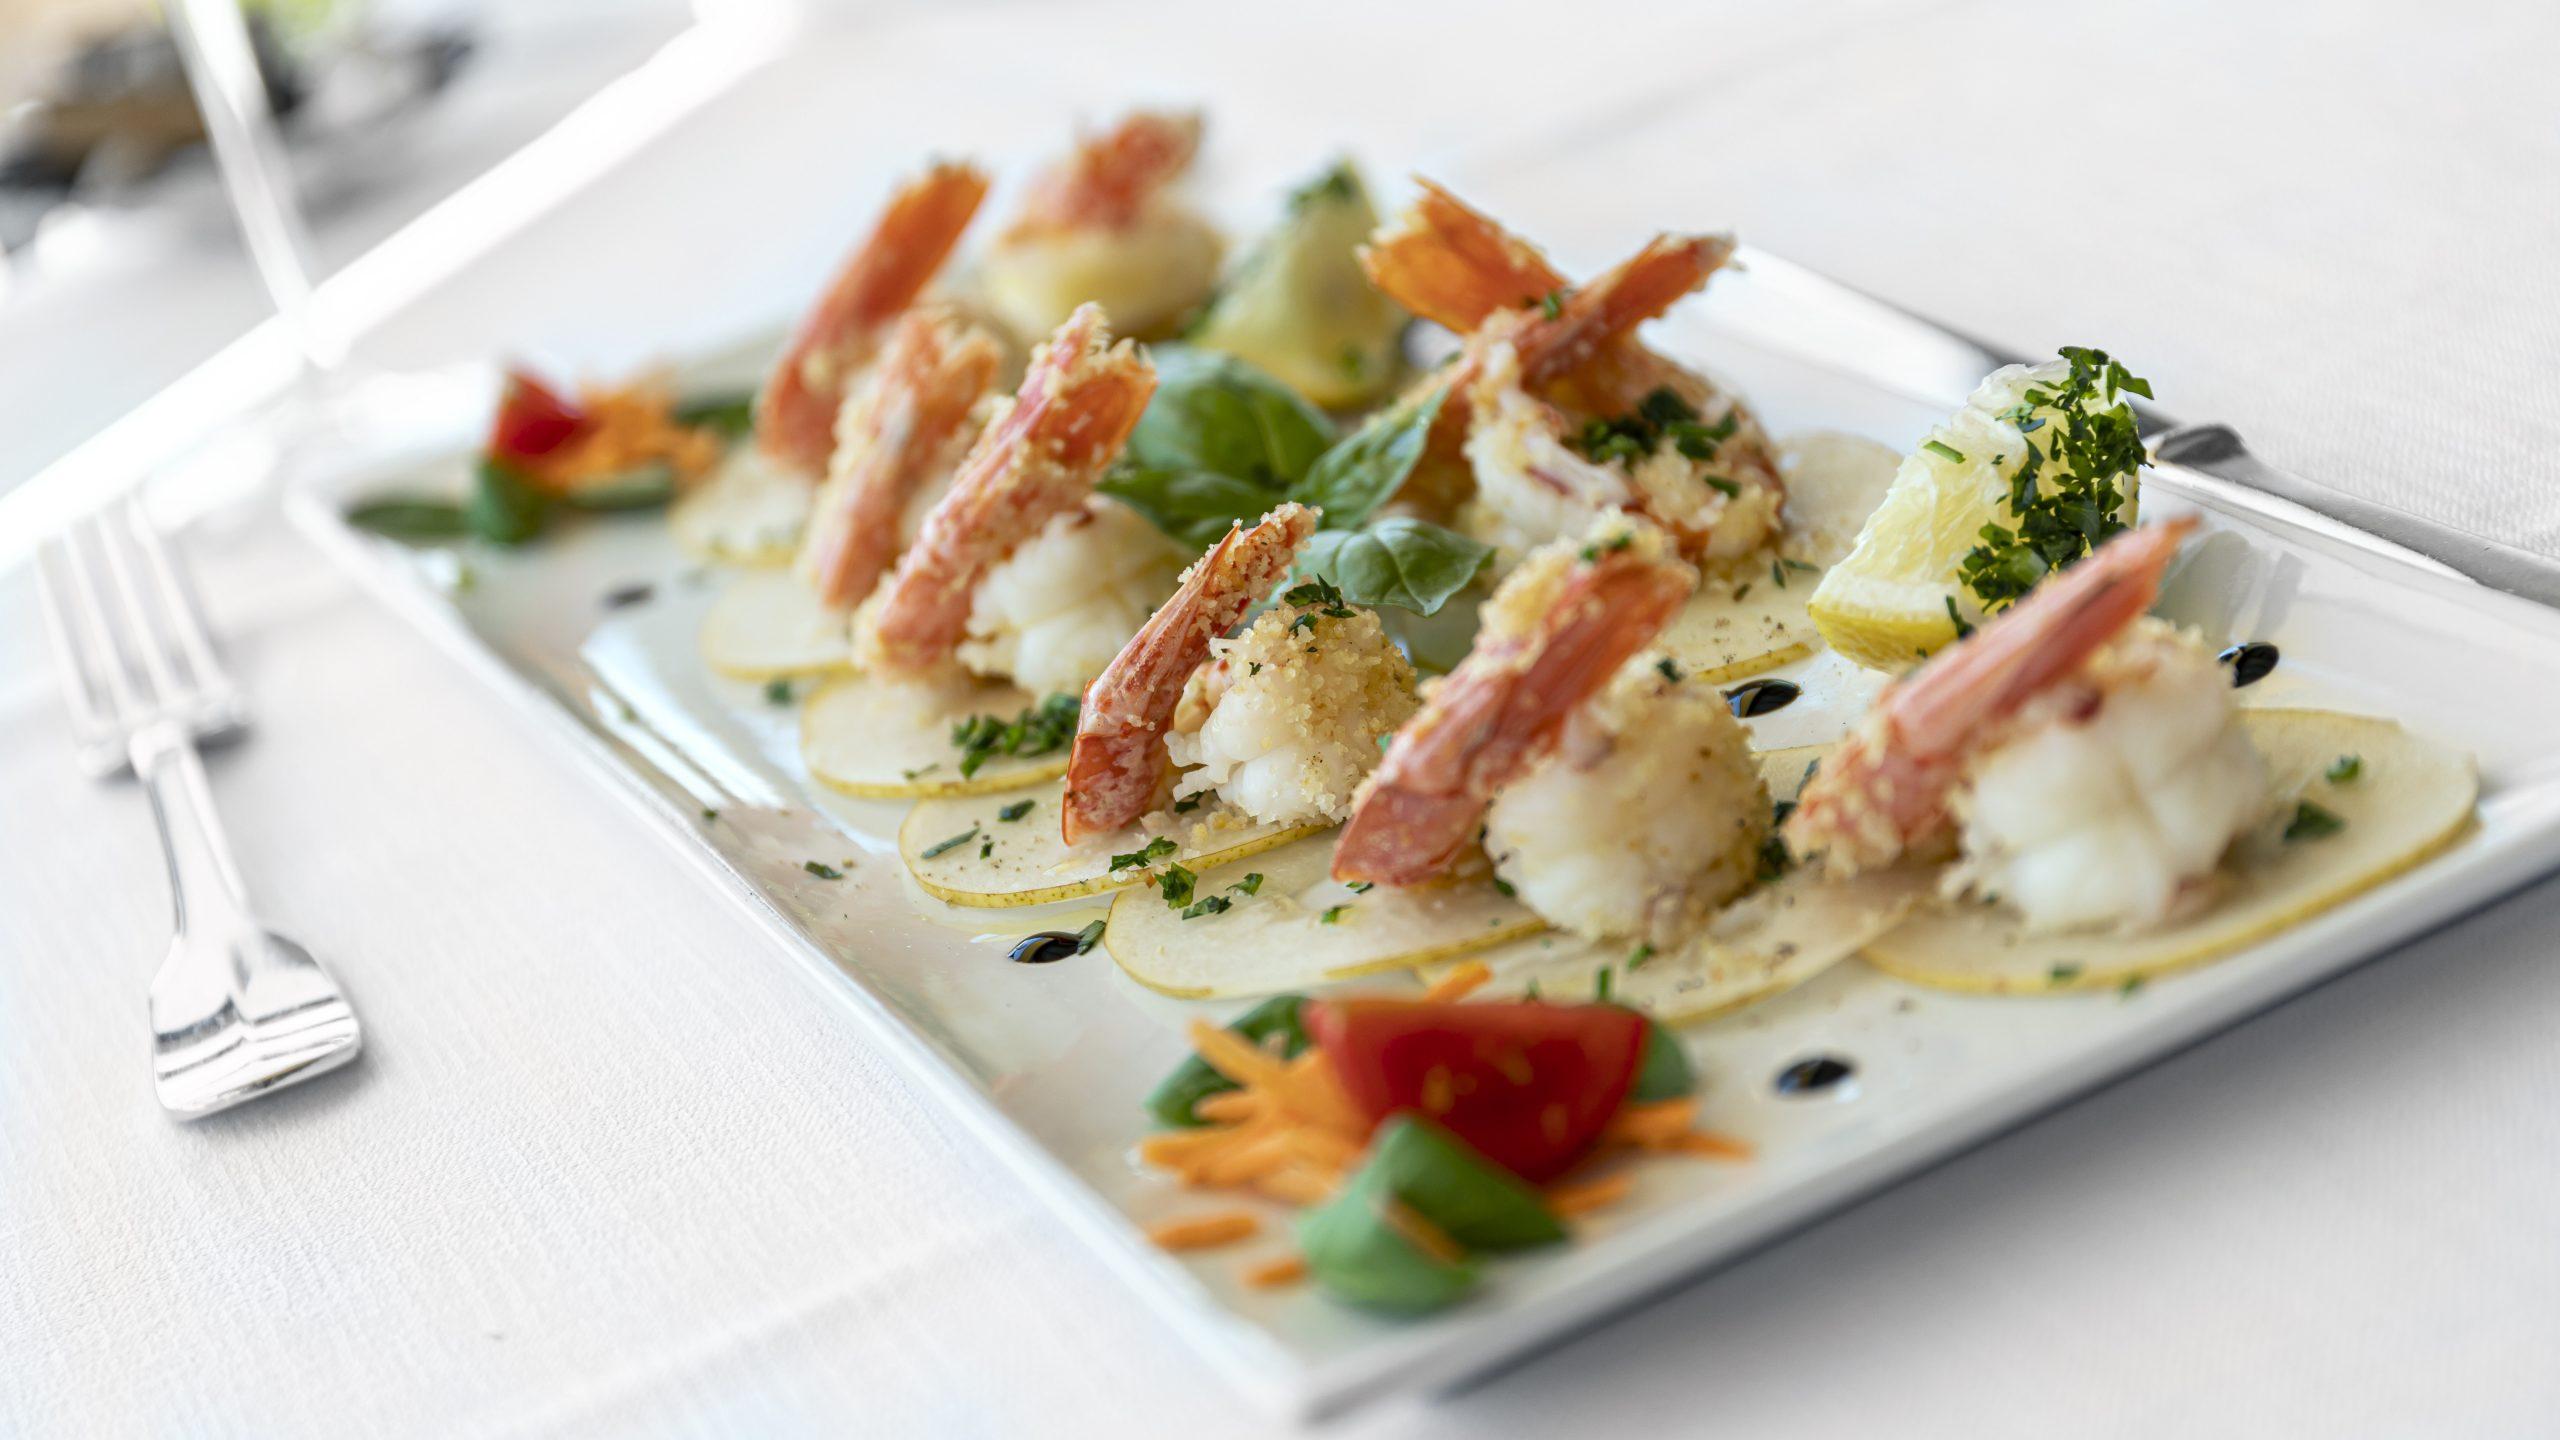 ristorante-di-pesce-caorle